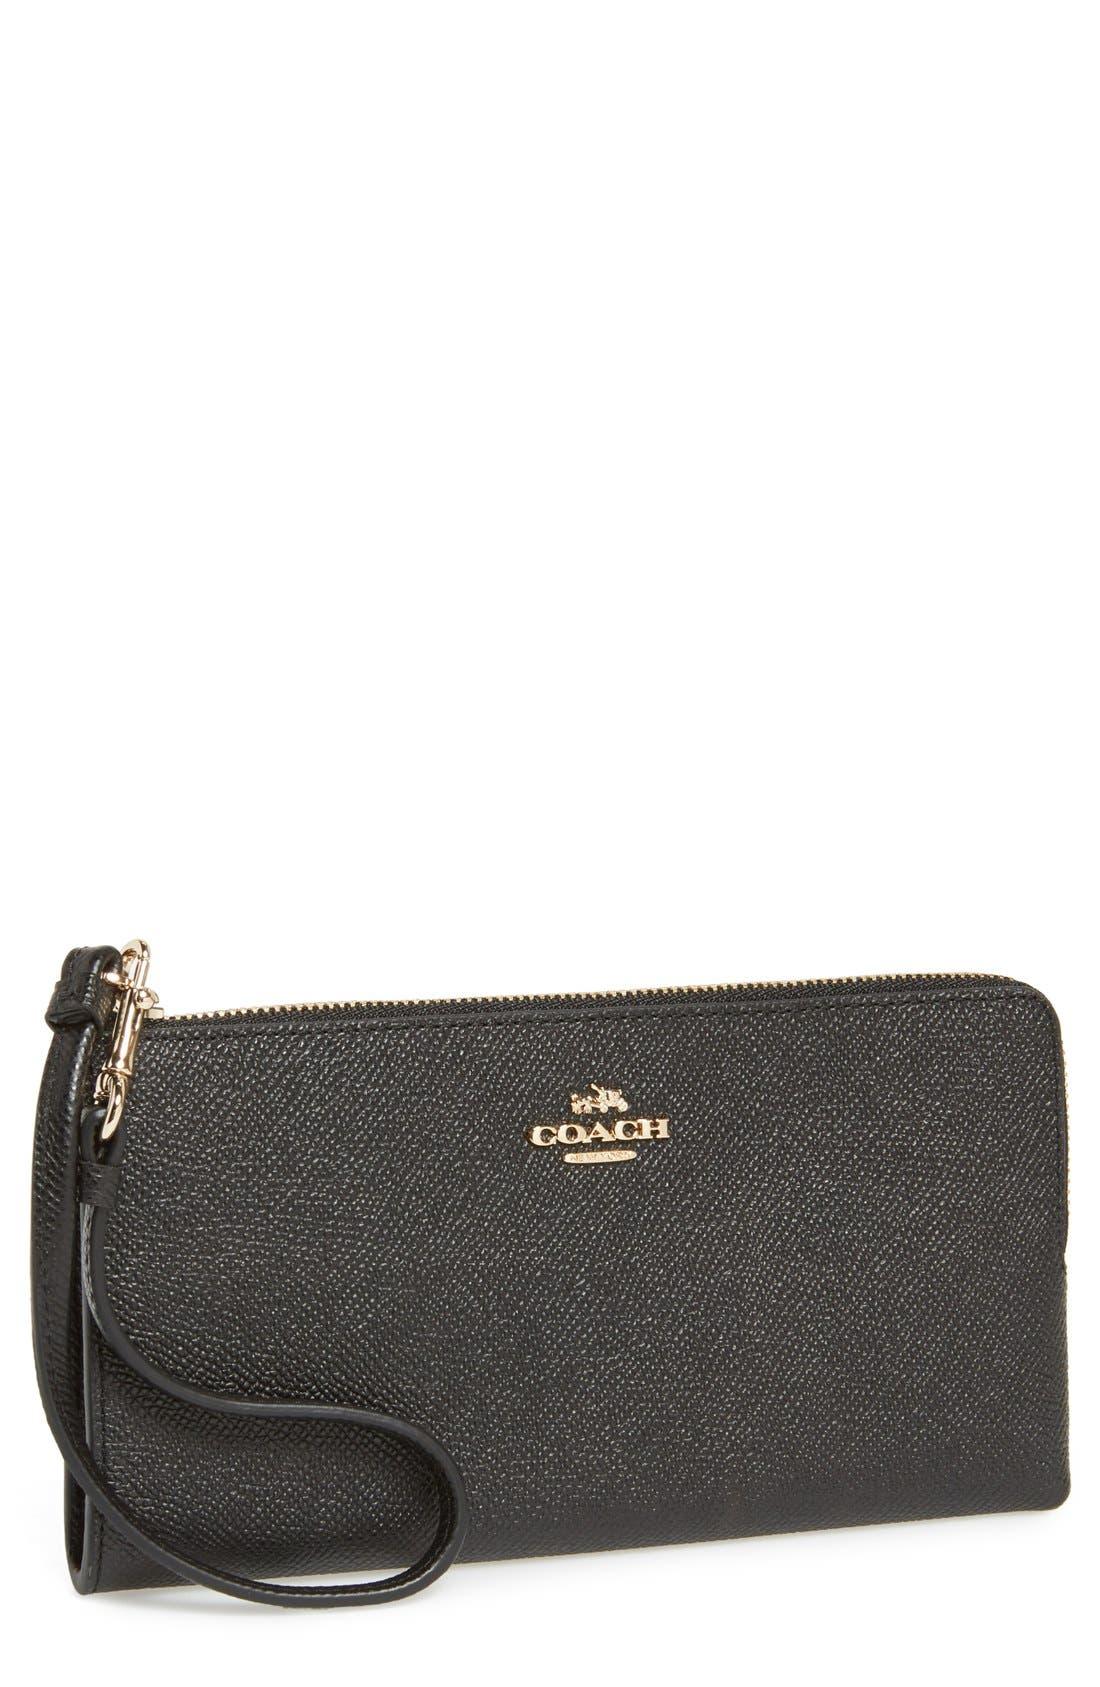 'Zippy' Leather Wallet, Main, color, 001